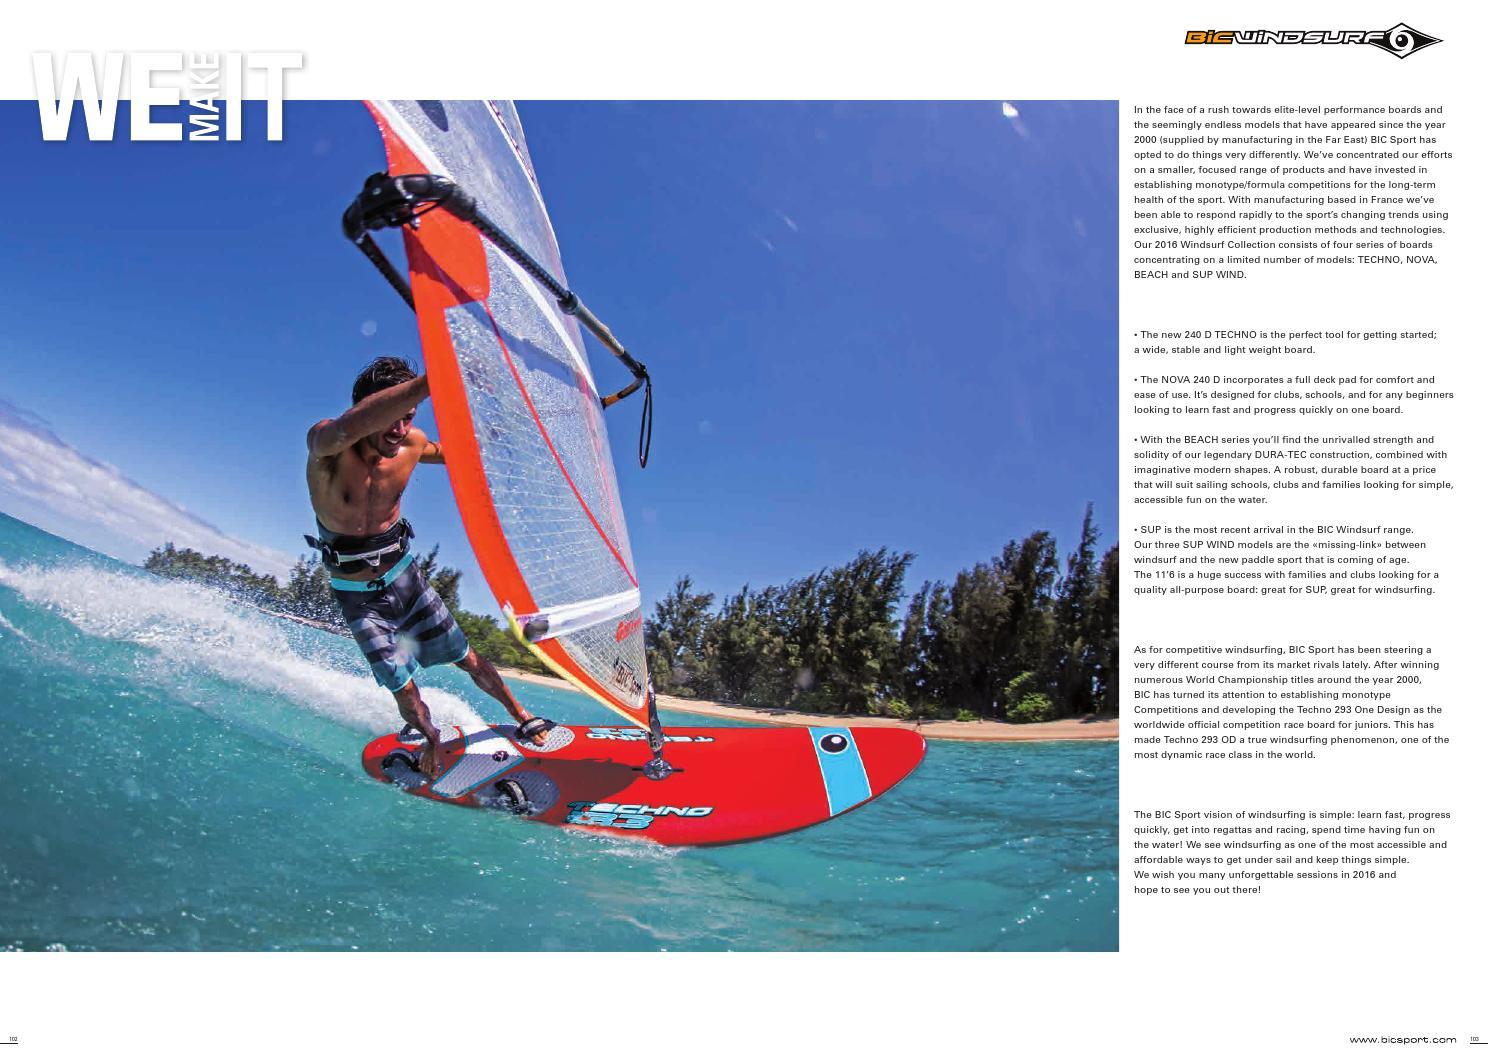 BIC Sport 2016 Windsurf by Michel Watersport - issuu